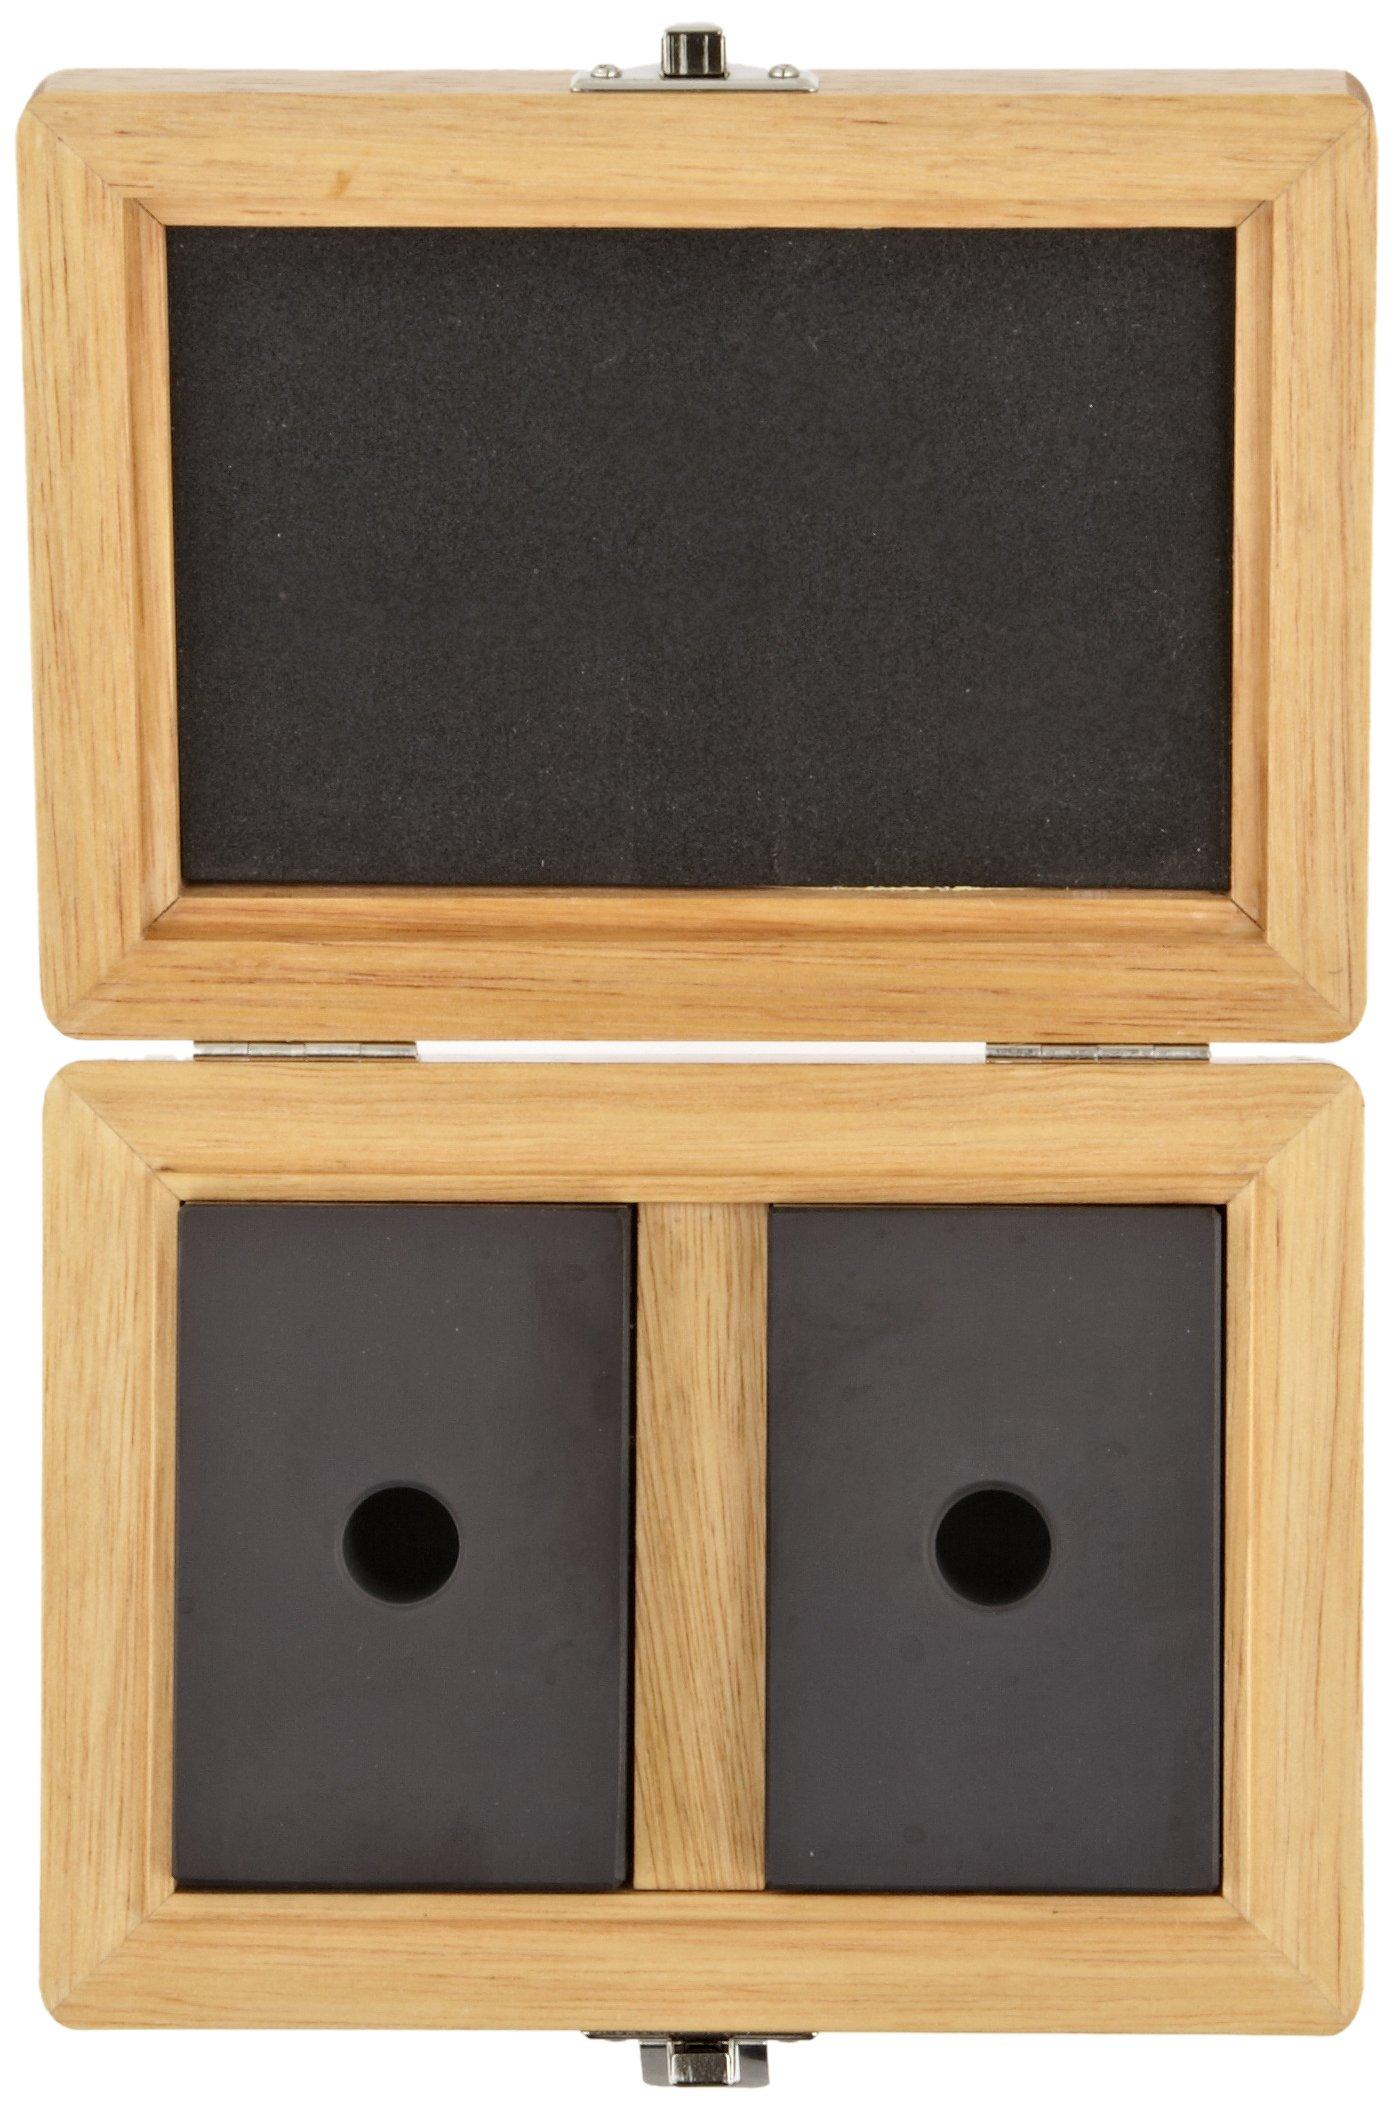 Fowler 53-439-101 Zirconia Ceramic 1-2-3 Blocks, 1'' Thickness x 2'' Width x 3'' Length